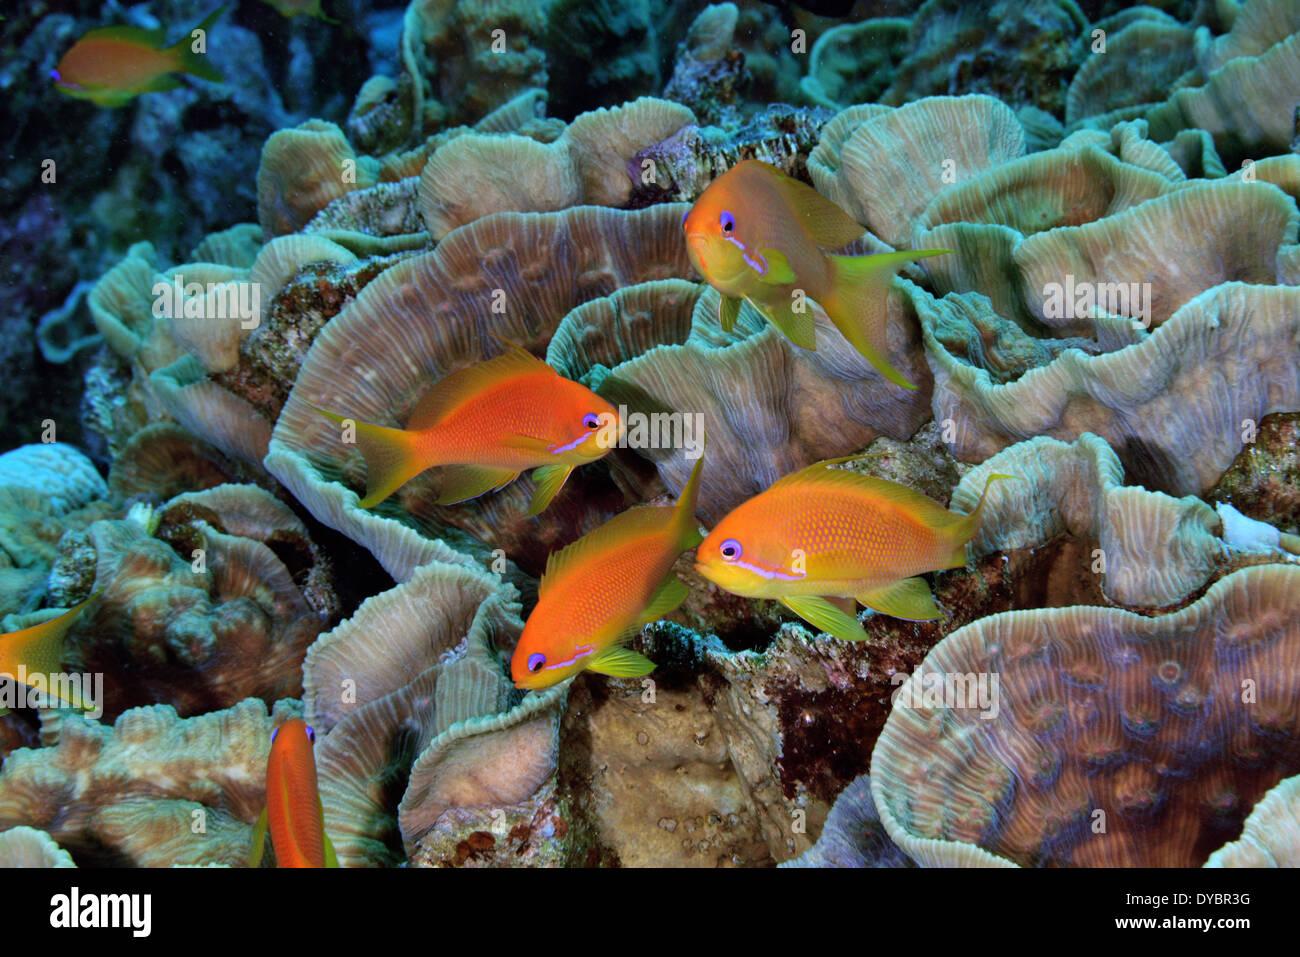 Female scalefin or lyretail anthias, Pseudanthias squamipinnis and coral reef, Gulf of Aqaba, Red Sea, Jordan - Stock Image